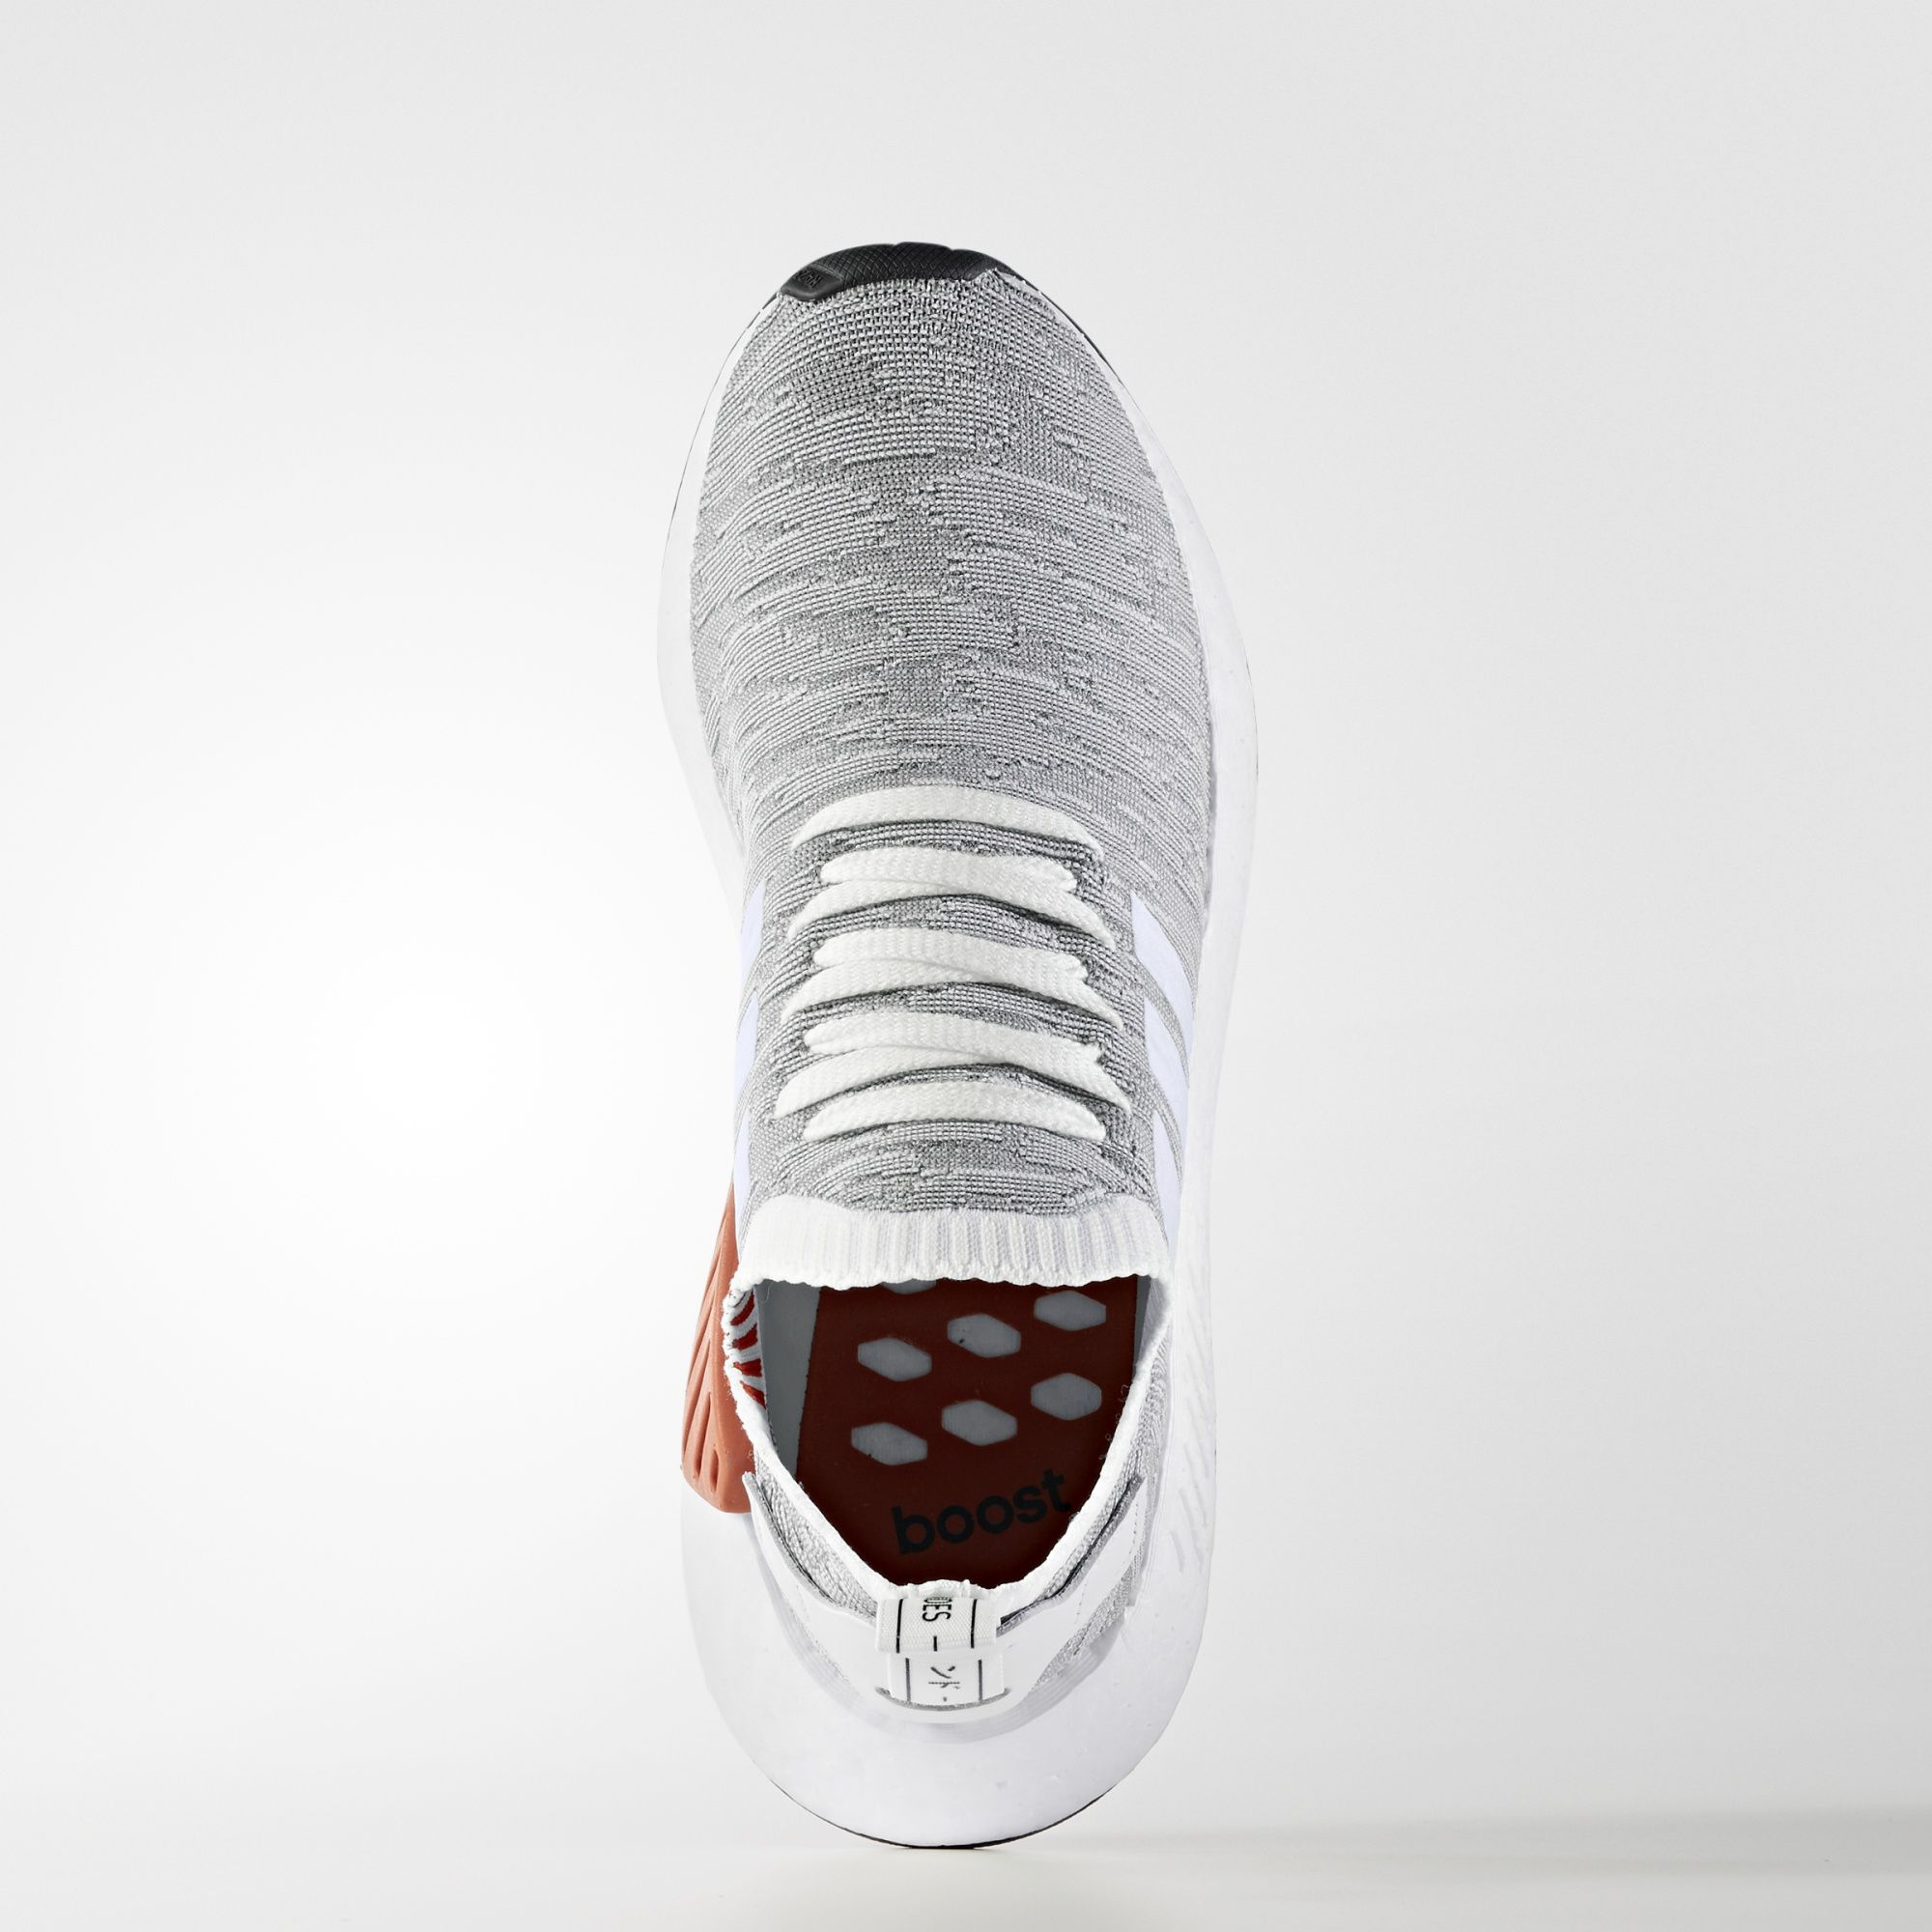 adidas NMD R2 Primeknit White Black BY9410 1